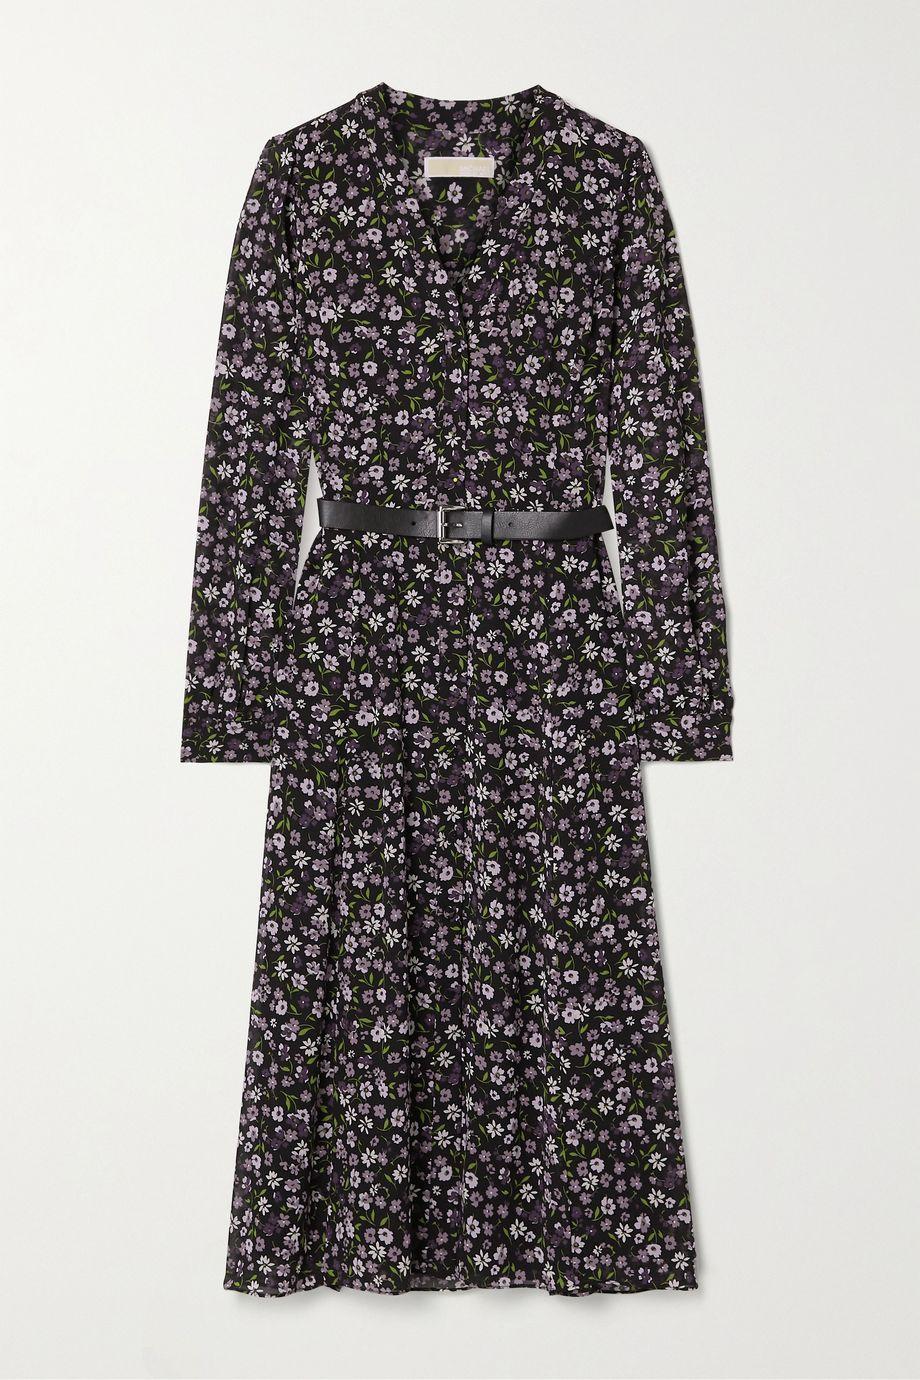 MICHAEL Michael Kors Belted floral-print georgette midi dress